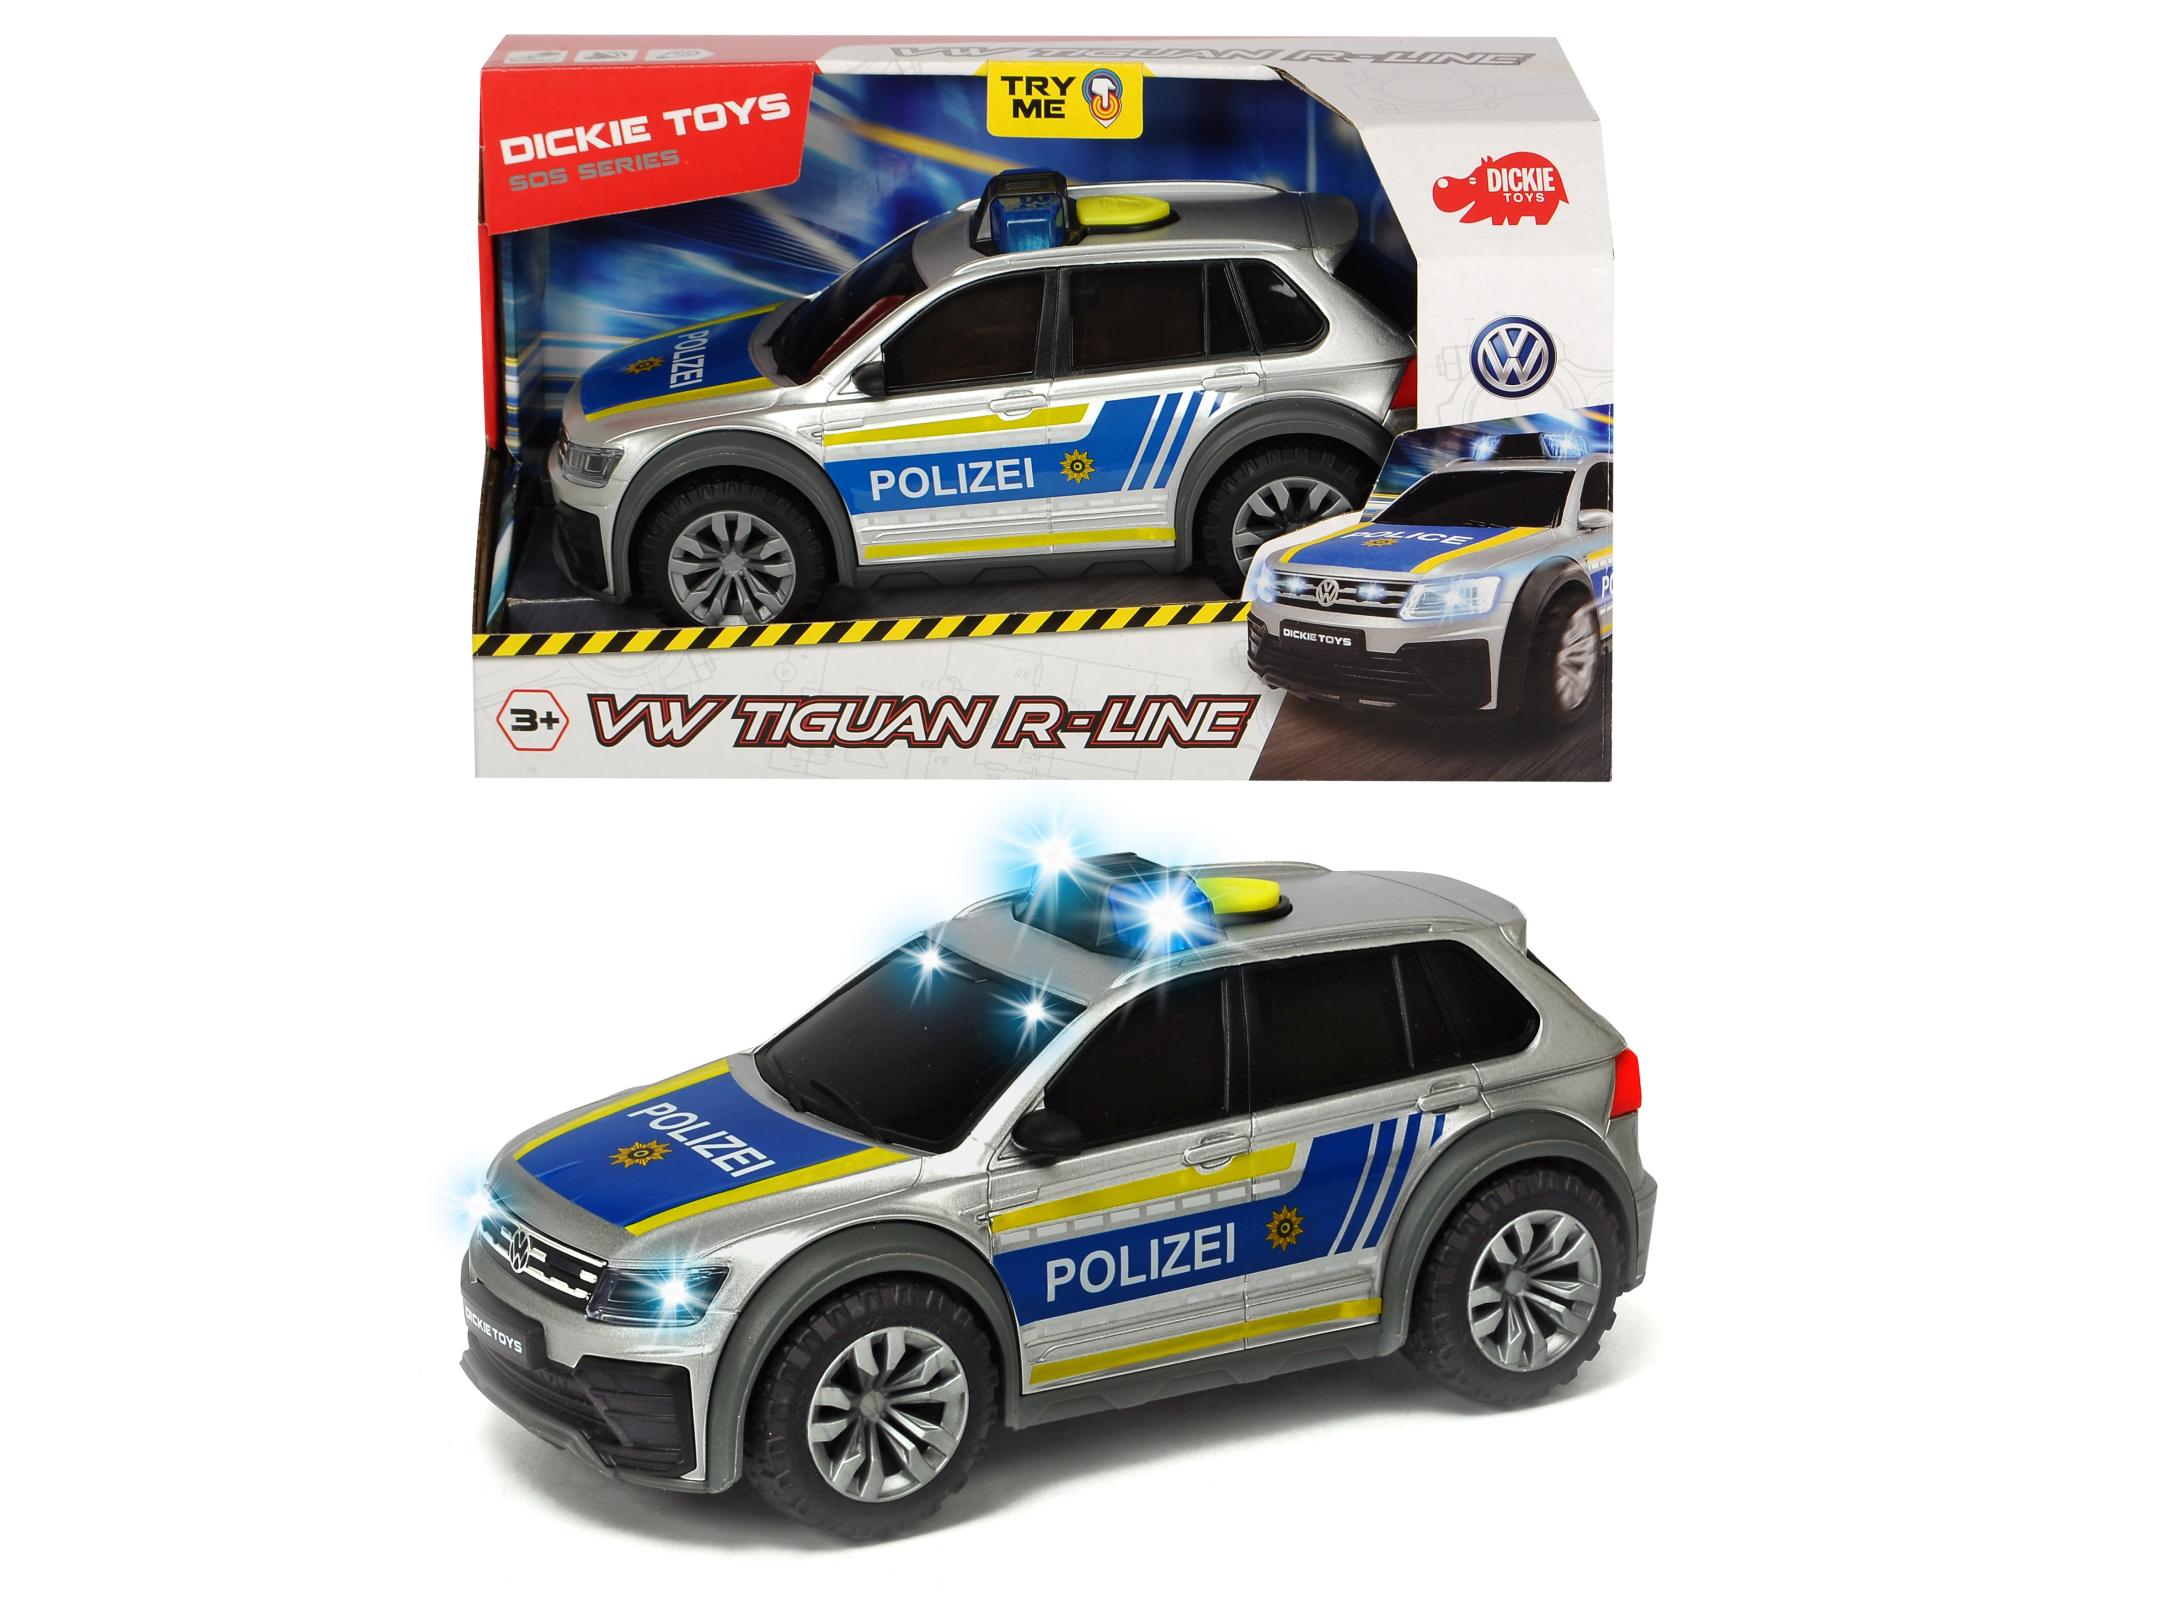 VW Tiguan R-Line Polizei